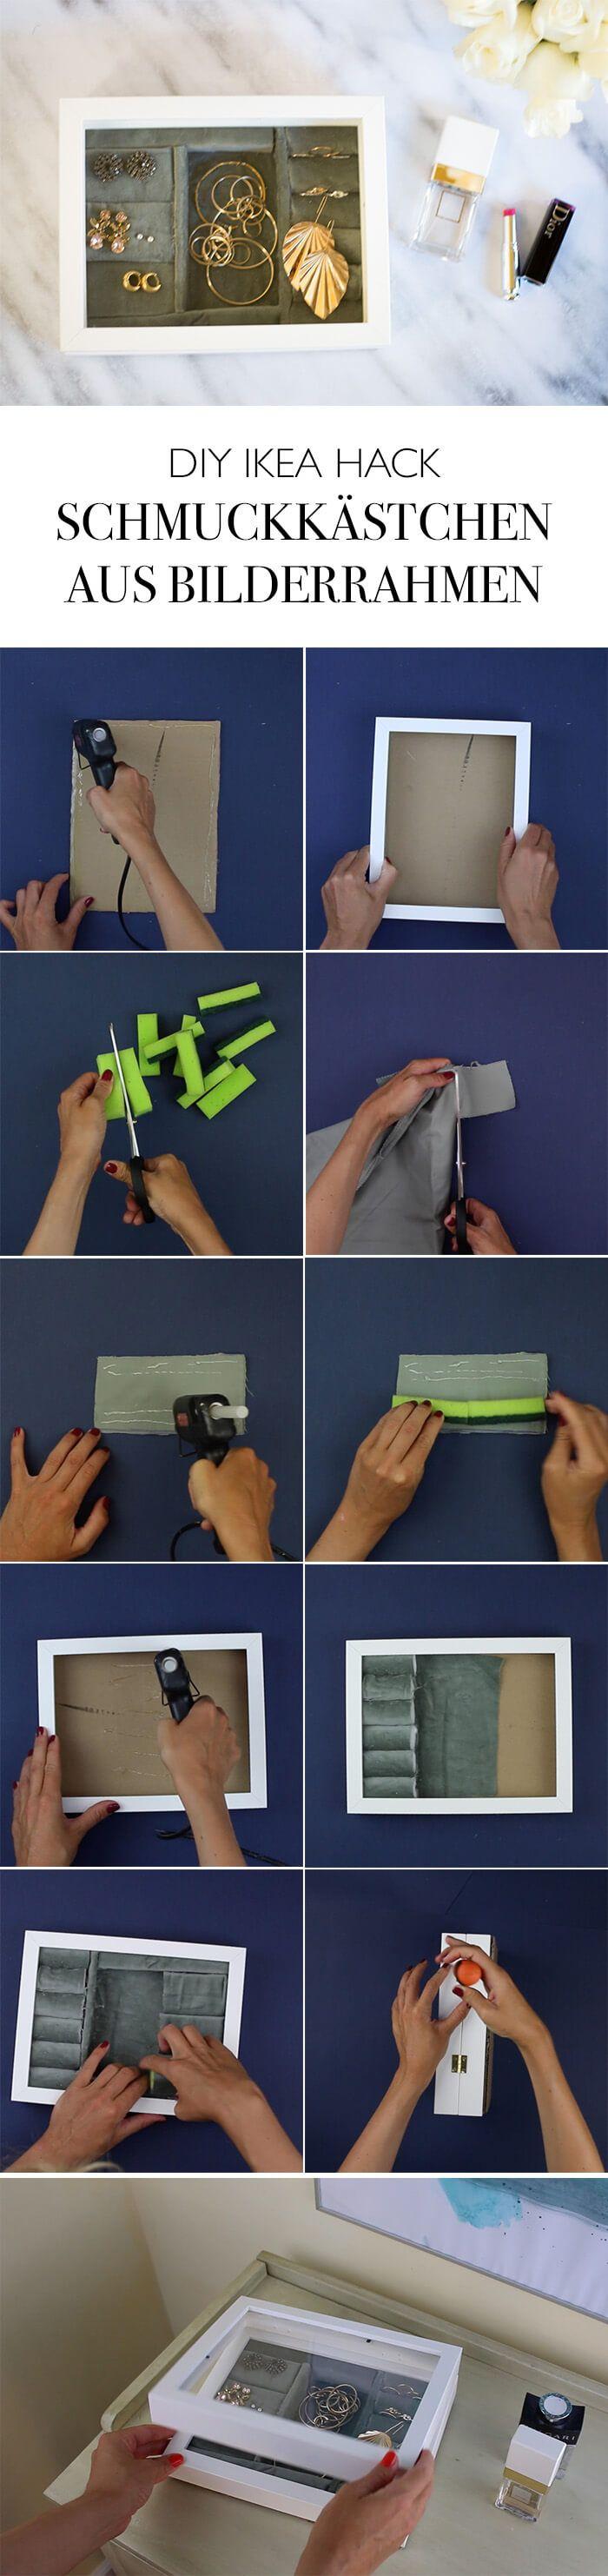 DIY SCHMUCKKÄSTCHEN AUS BILDERRAHMEN – UPCYCLING #IKEAHACK – Linda loves… DIY & basteln & selber machen